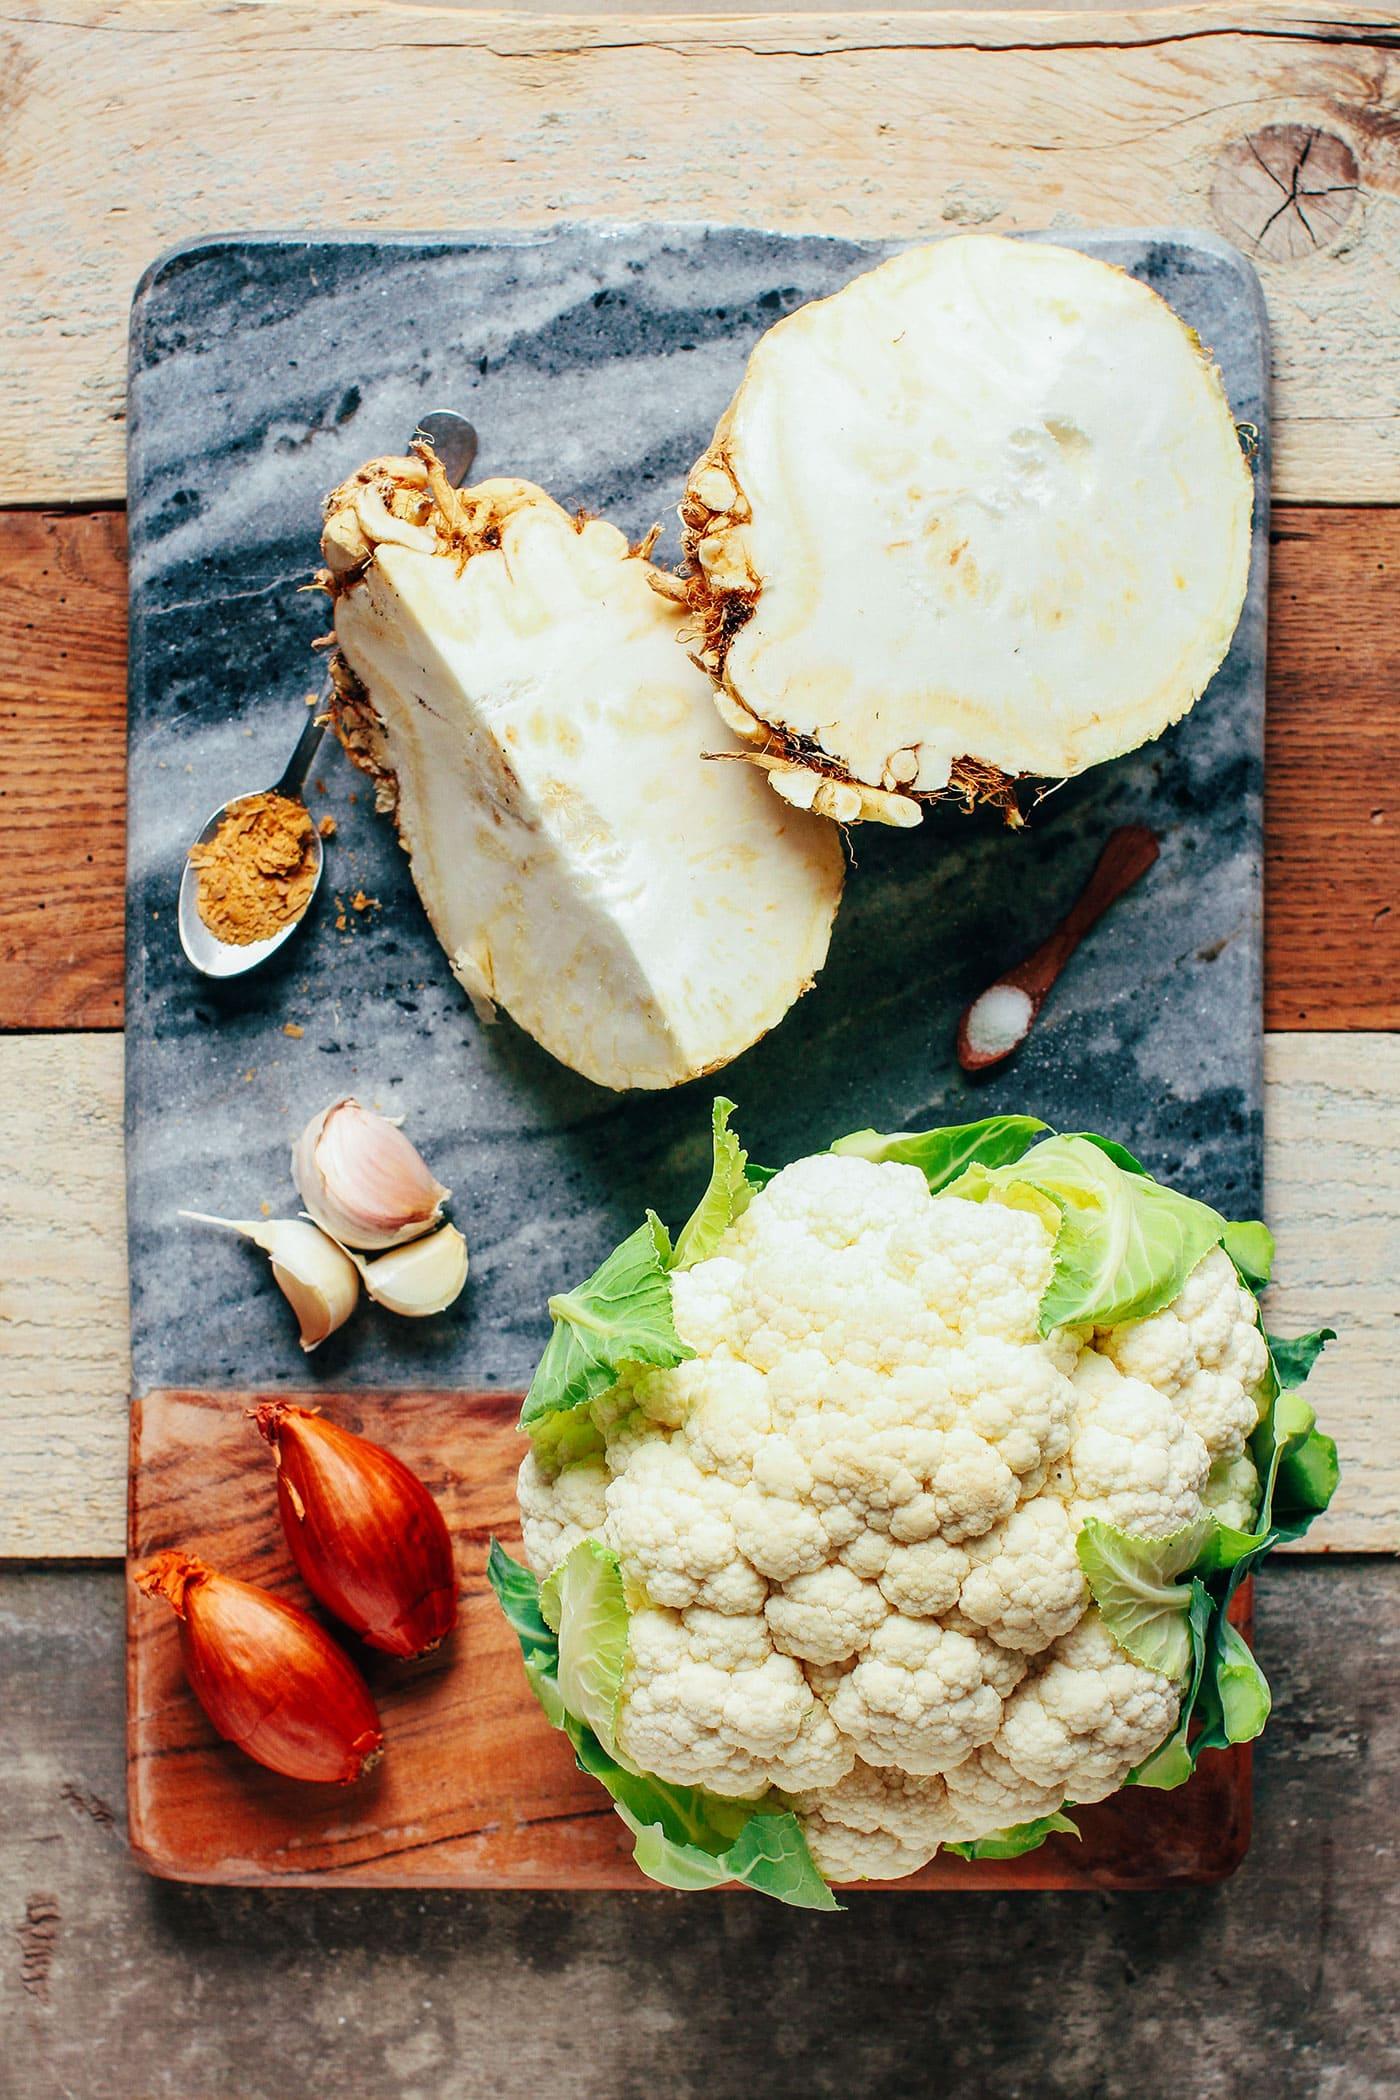 Celery Root & Cauliflower Purée